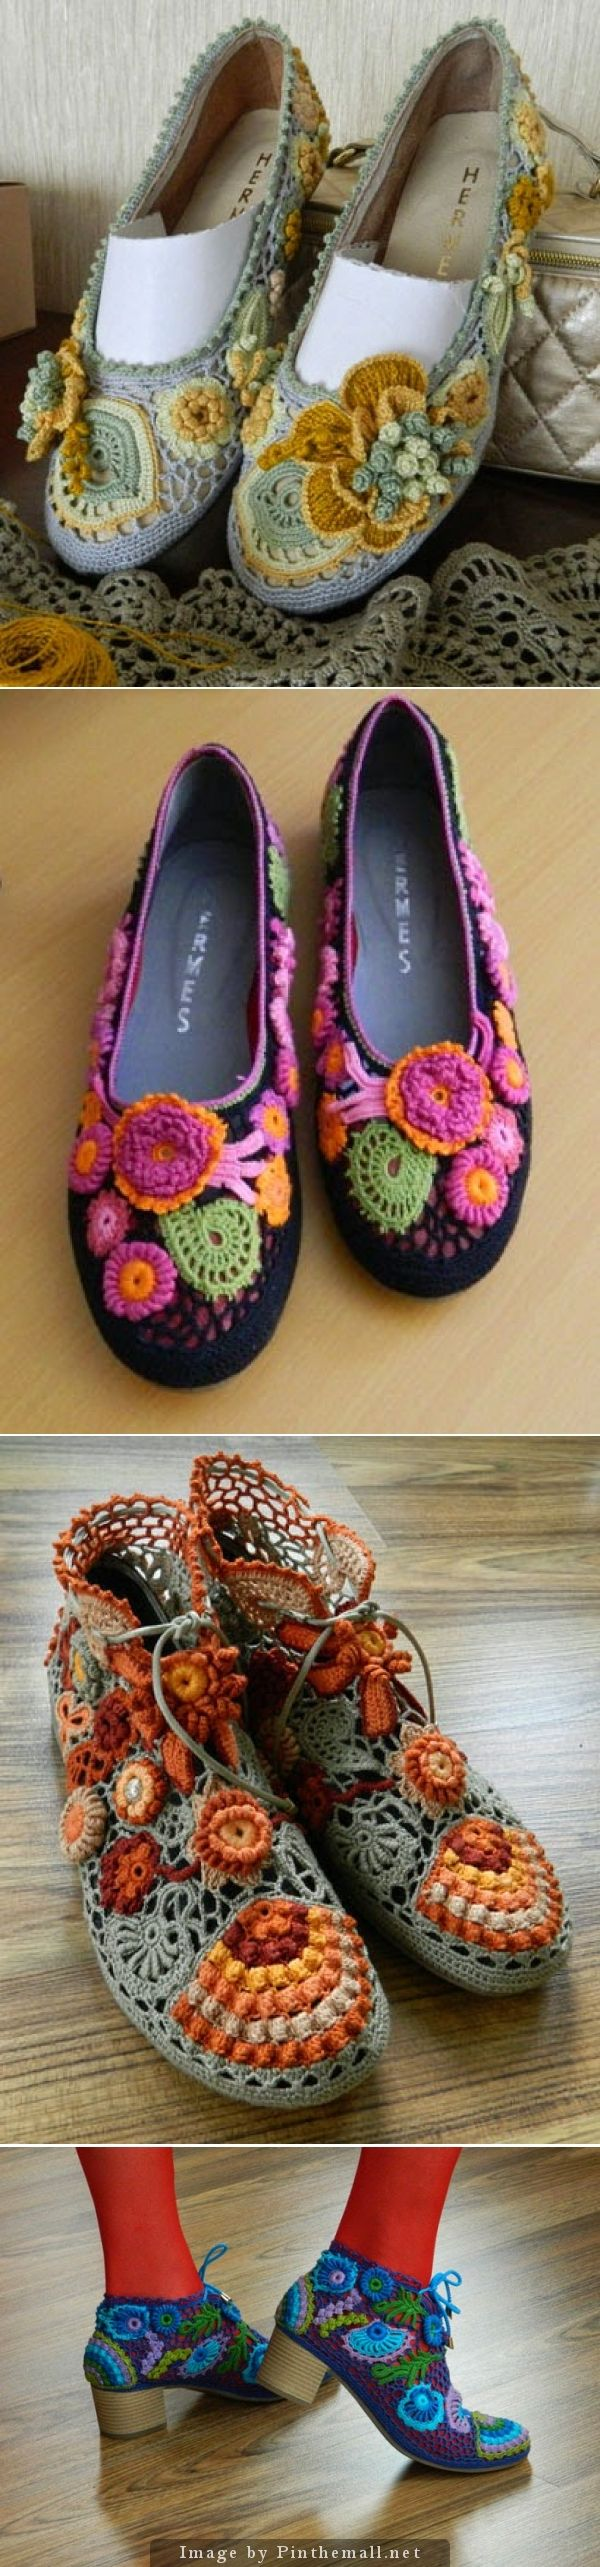 """Totally fabulous #Irish #Crochet #Shoes by Ukranian designer Olena Melnyk.-wow!"